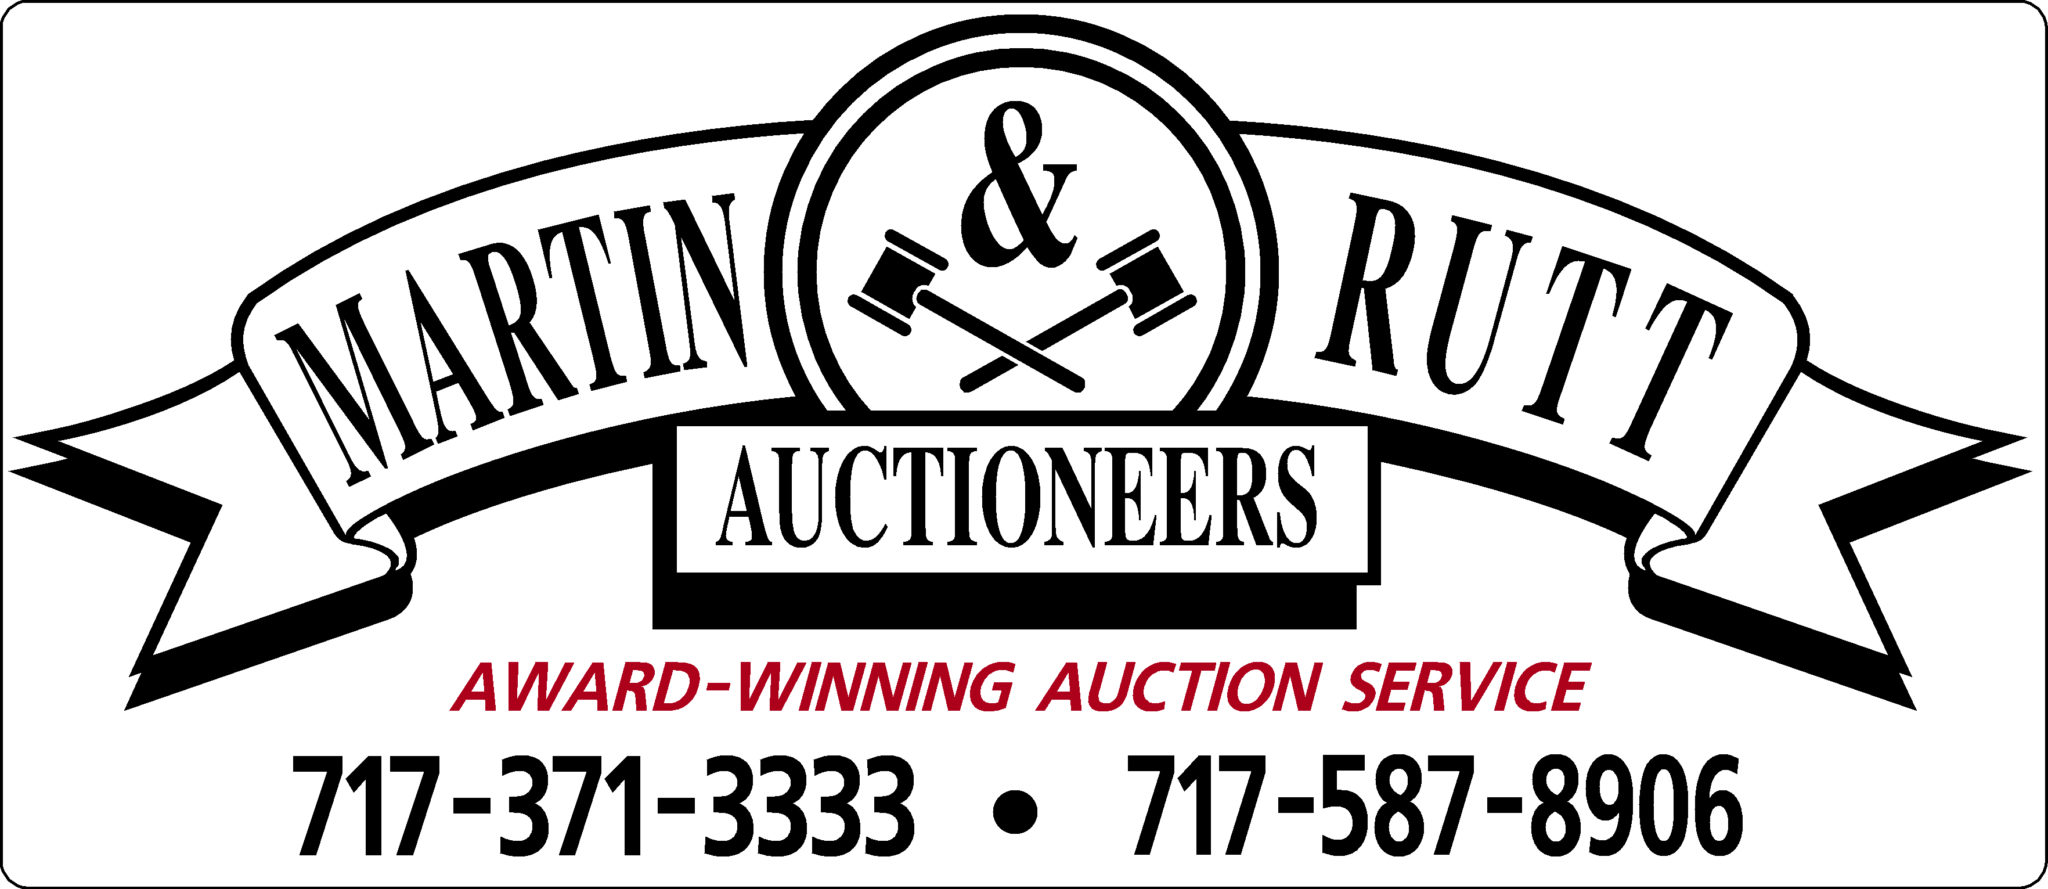 martin & rutt auctioneers